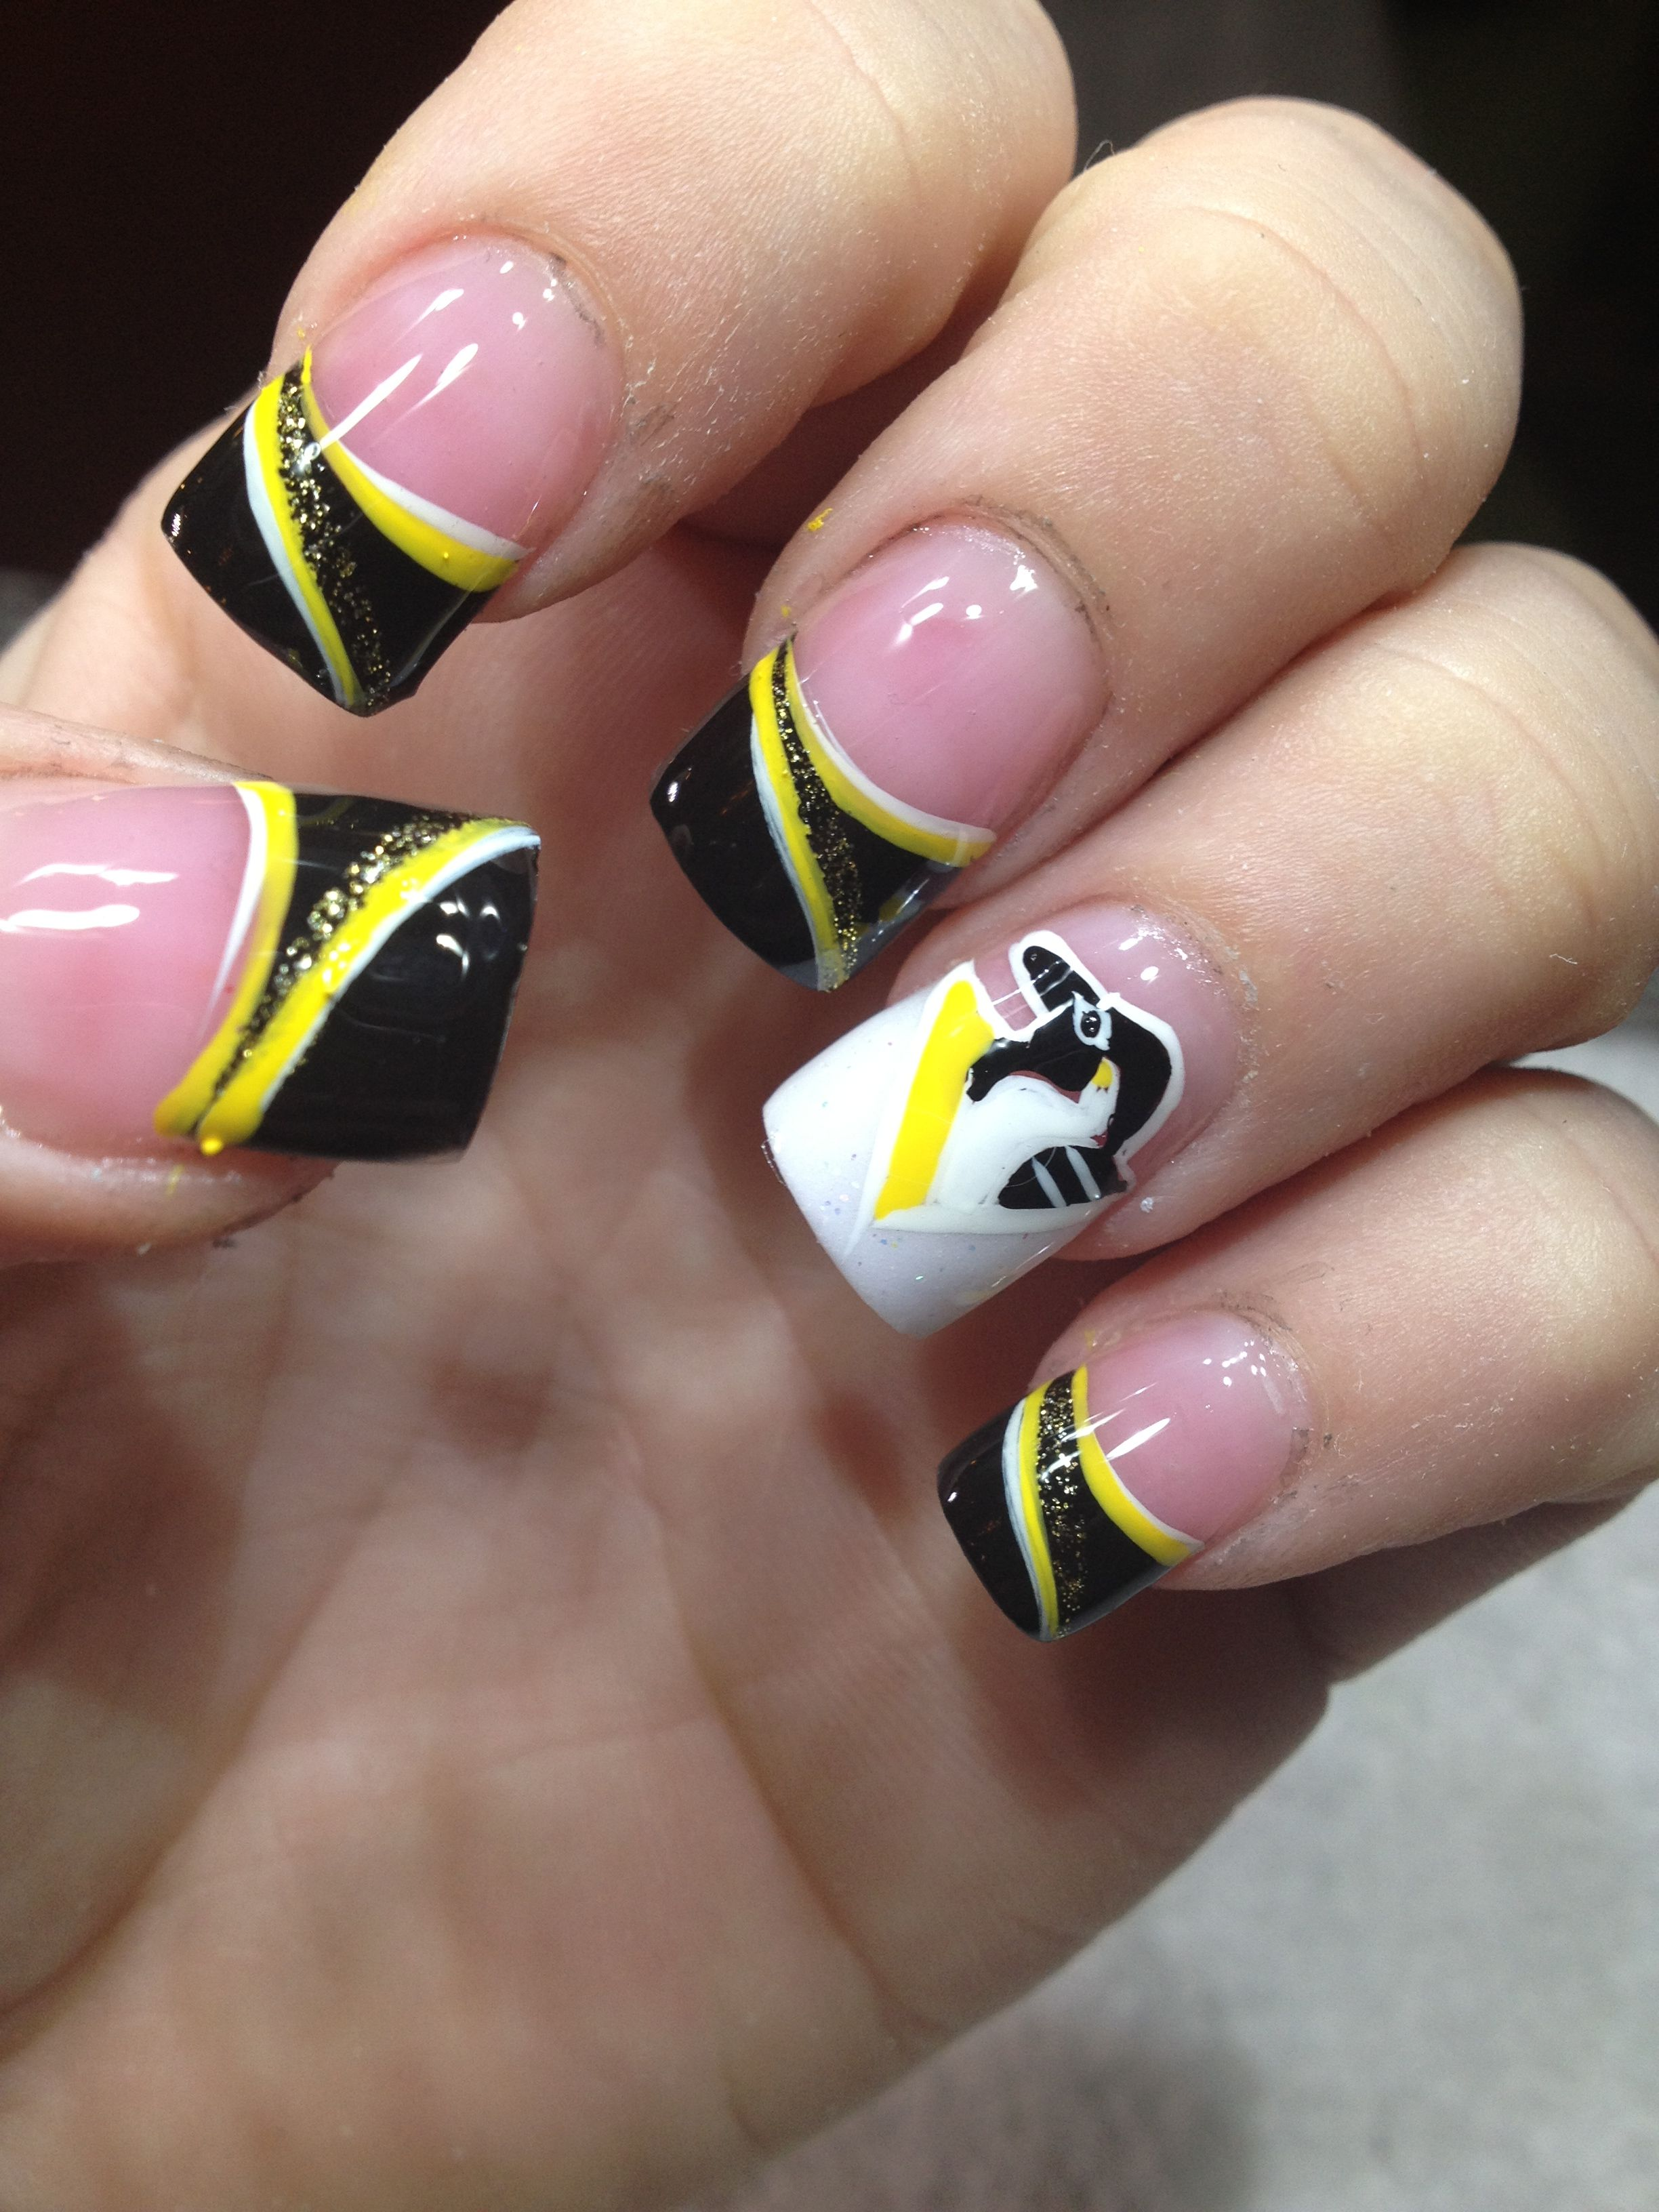 old pens logo manicure... hockey nails - Hockey Nails | Pinterest